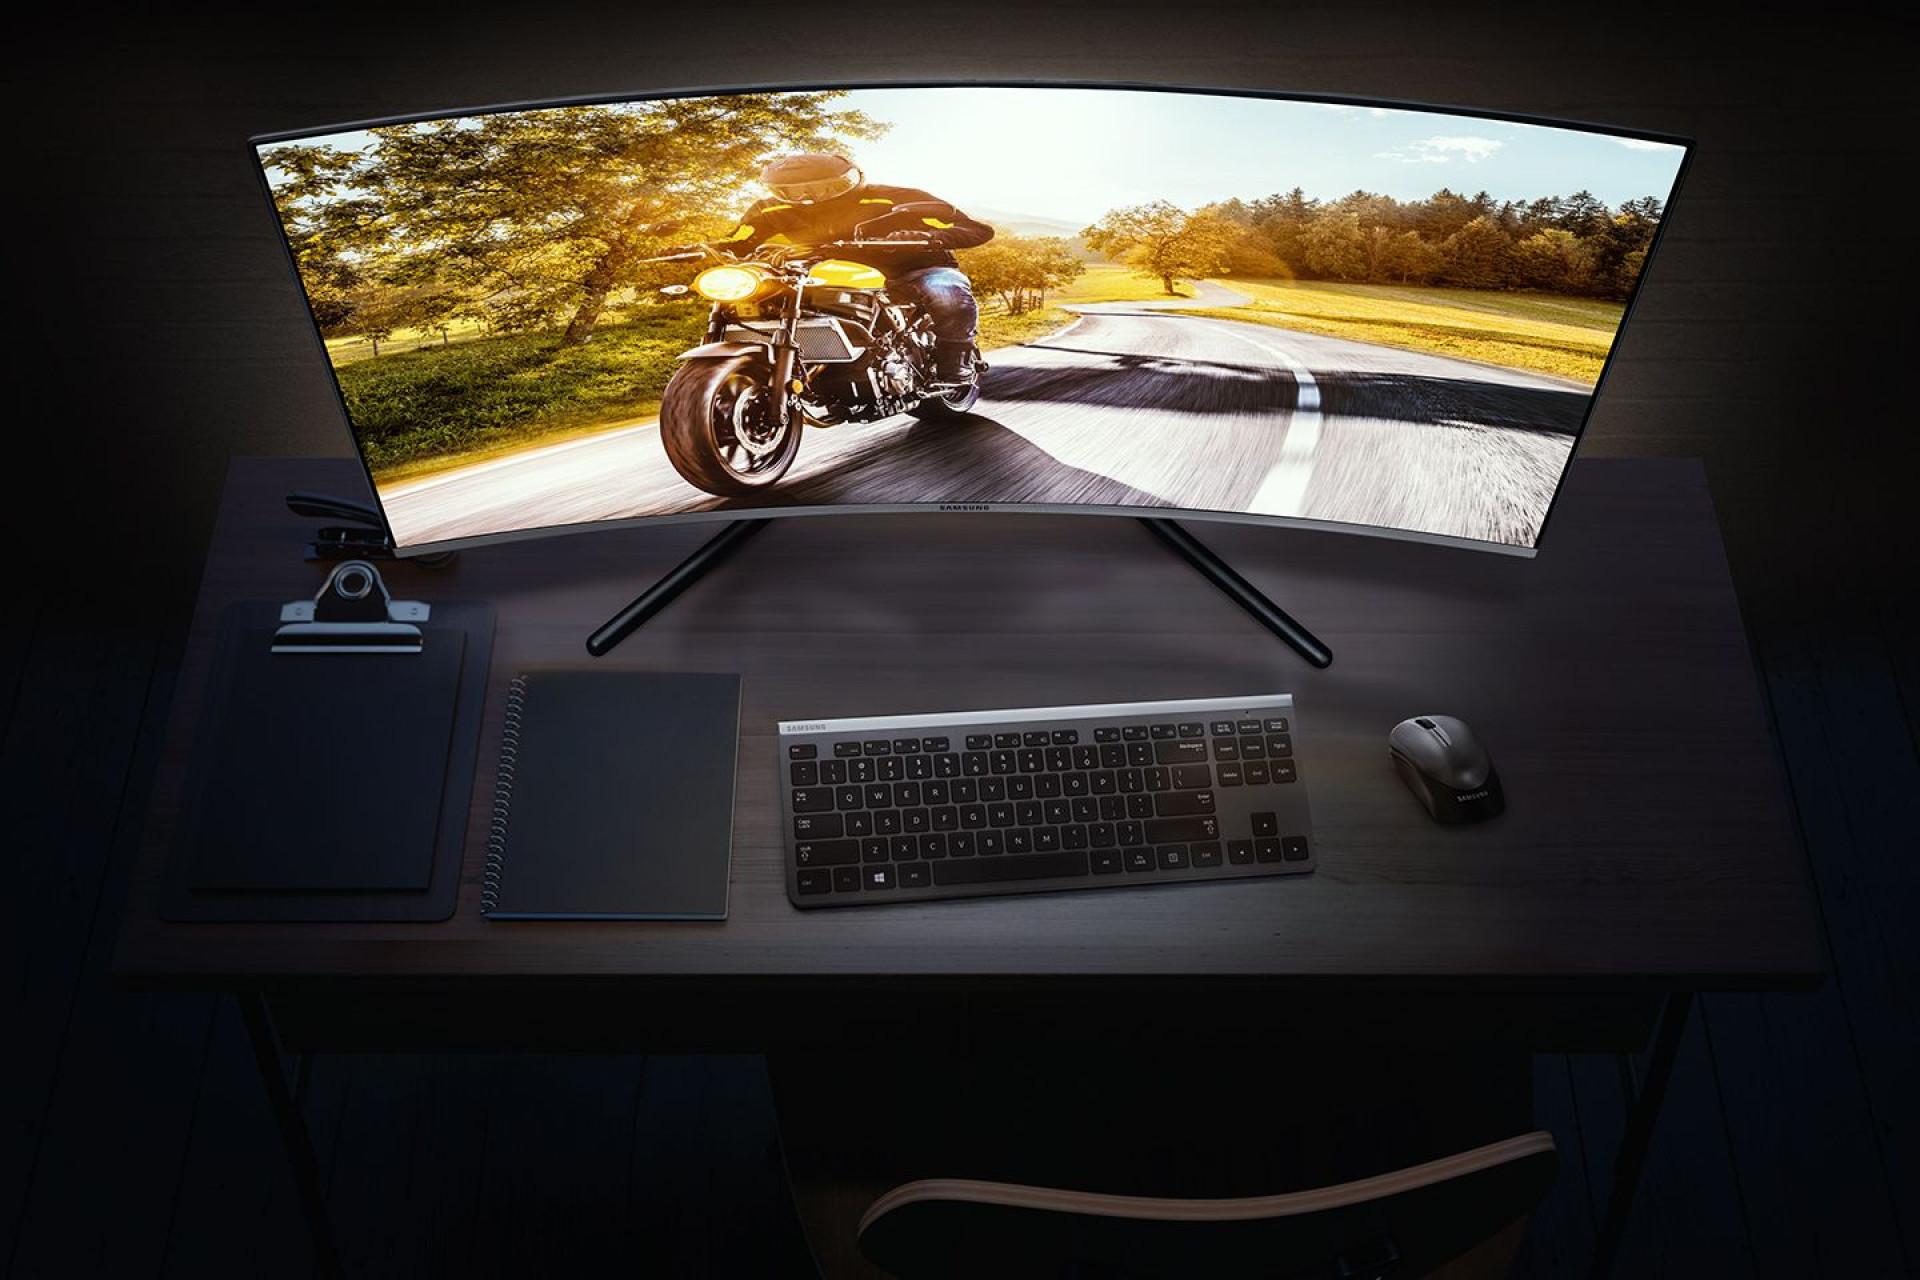 Samsung desvenda novos monitores para jogadores e criadores de conteúdo